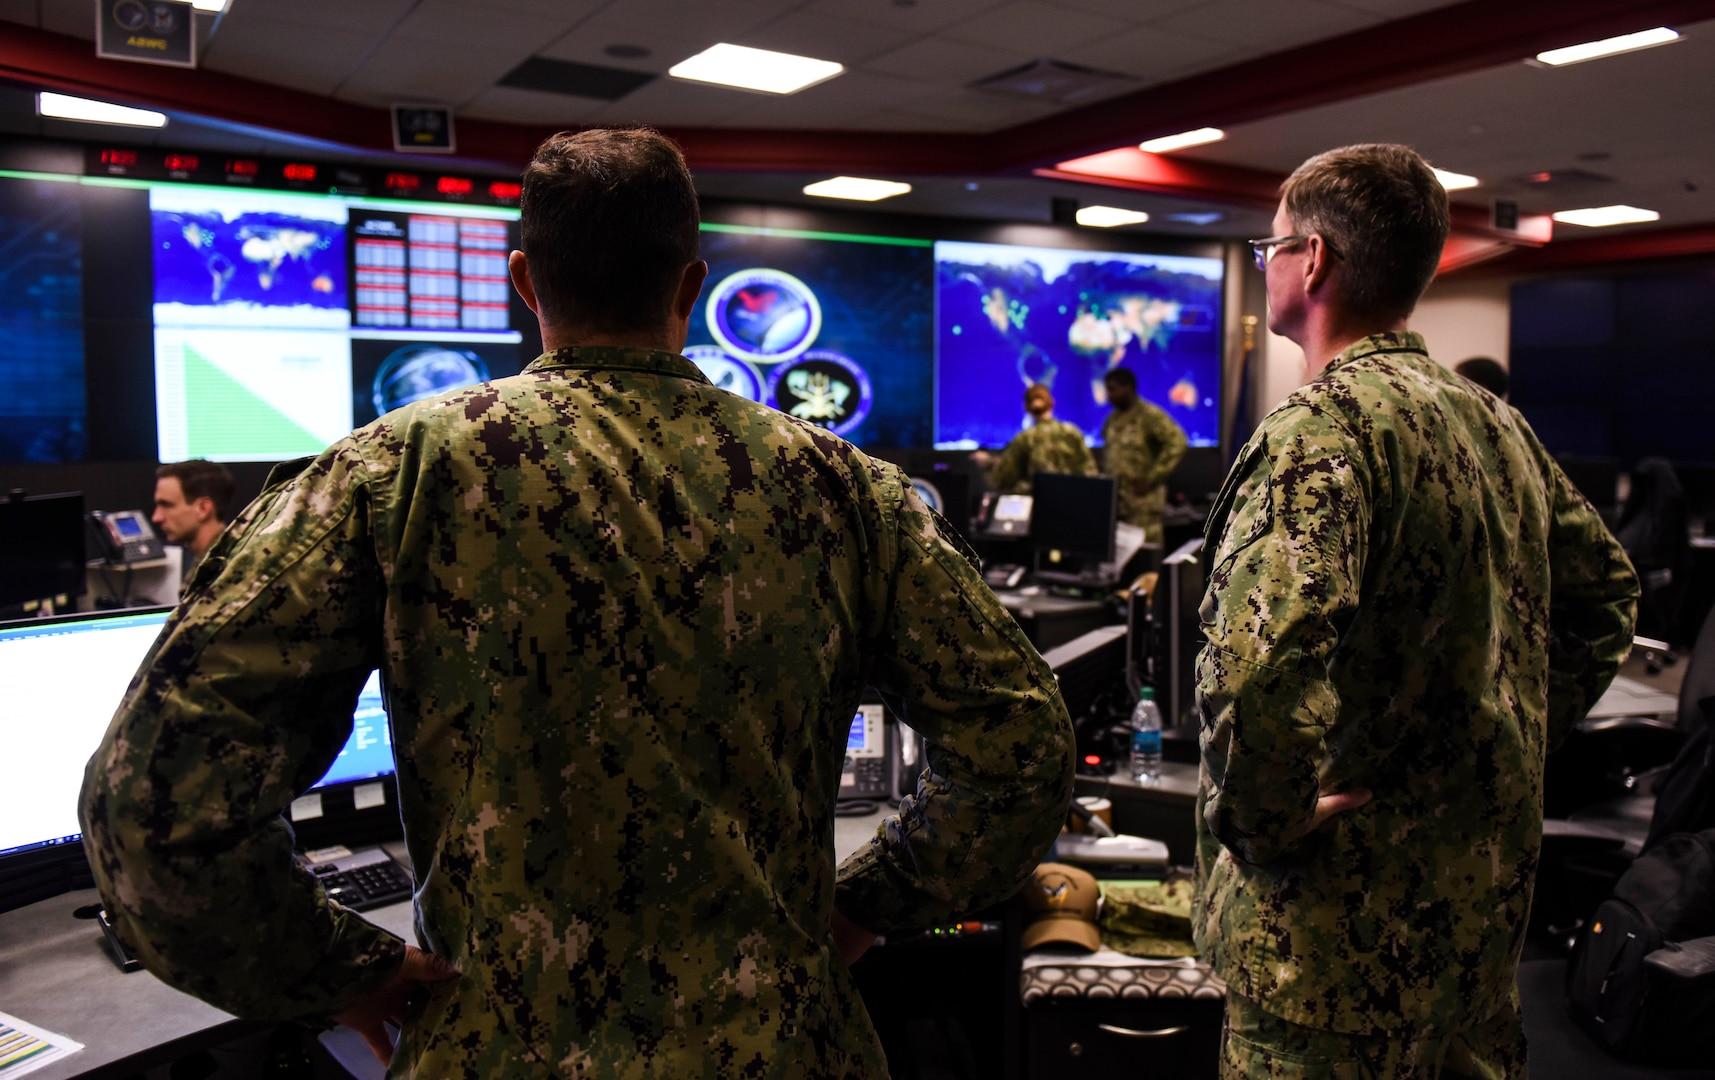 Sailors stand watch in Fleet Operations Center at headquarters of U.S. Fleet Cyber Command/U.S. 10th Fleet at Fort Meade, Maryland, September 27, 2018 (U.S. Navy/Samuel Souvannason)